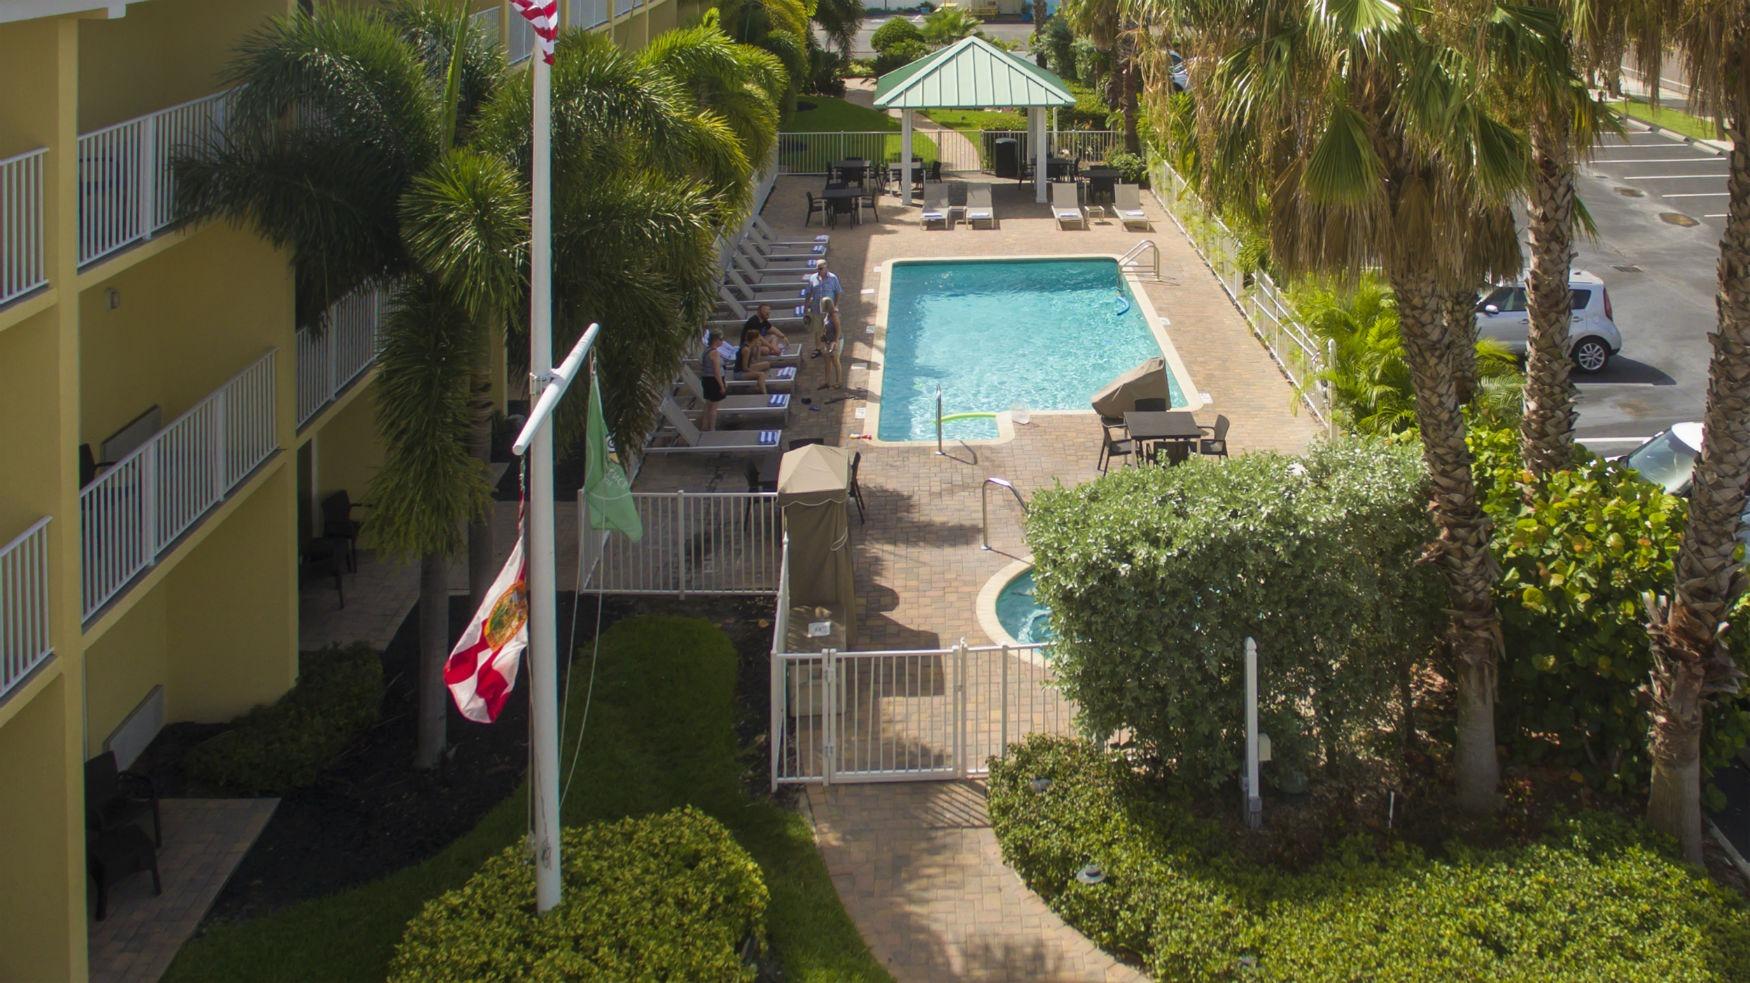 Treasure Bay Resort and Marina - Ariel view of swimming pool